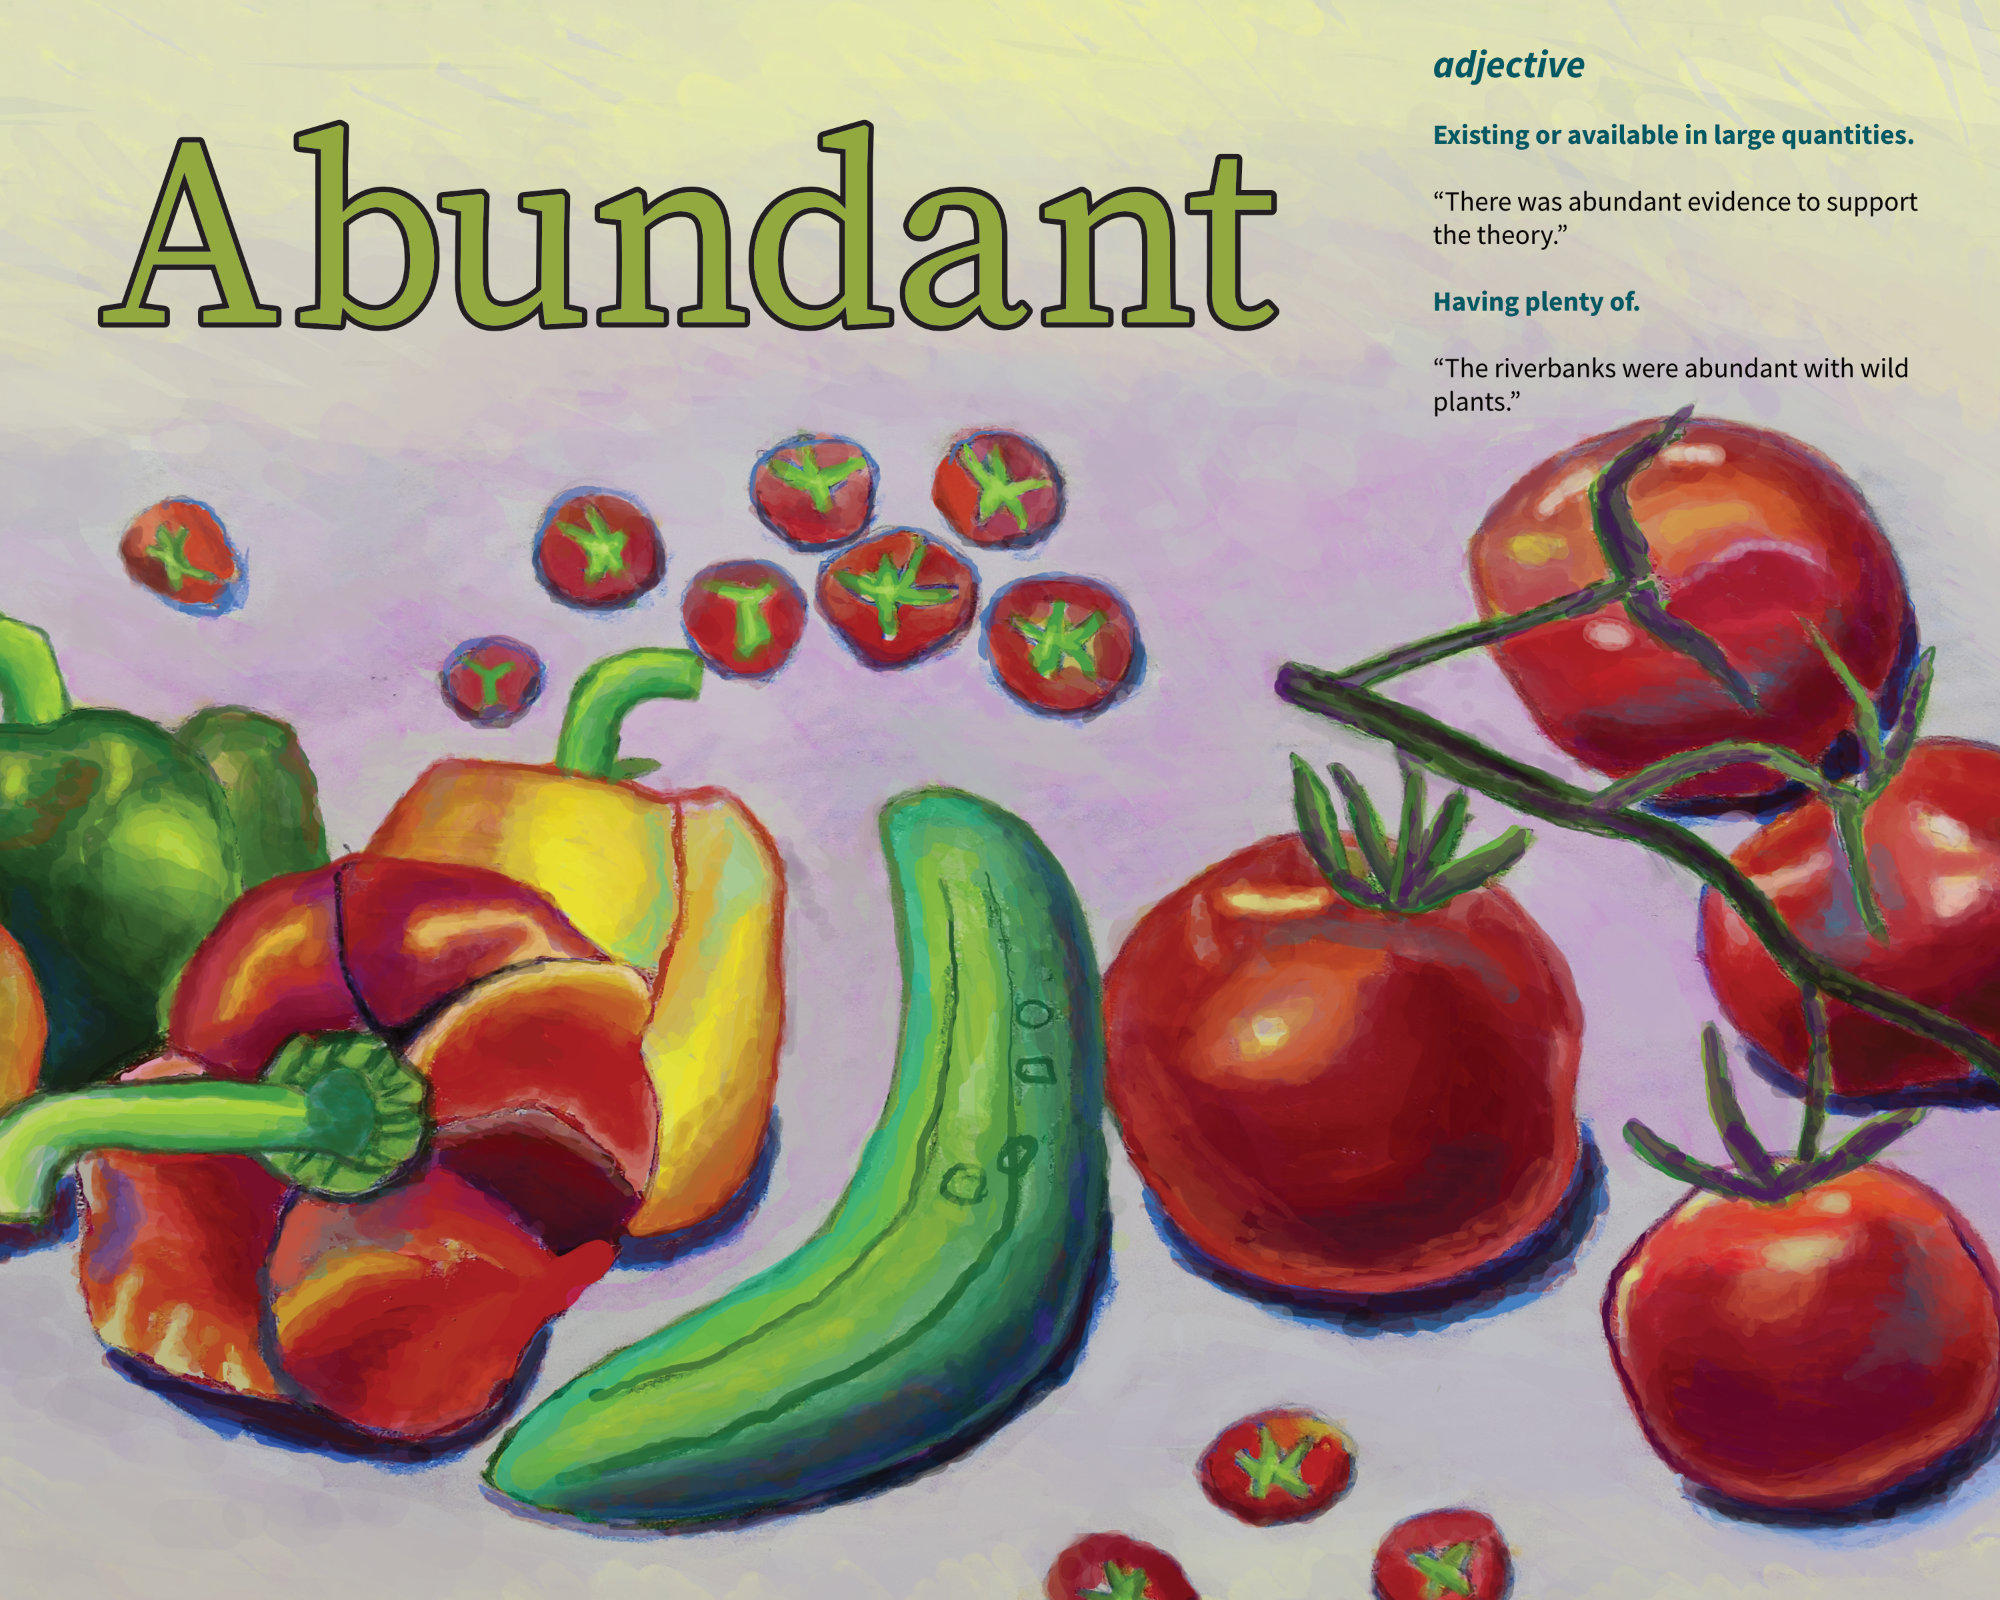 Abundant_withtext1